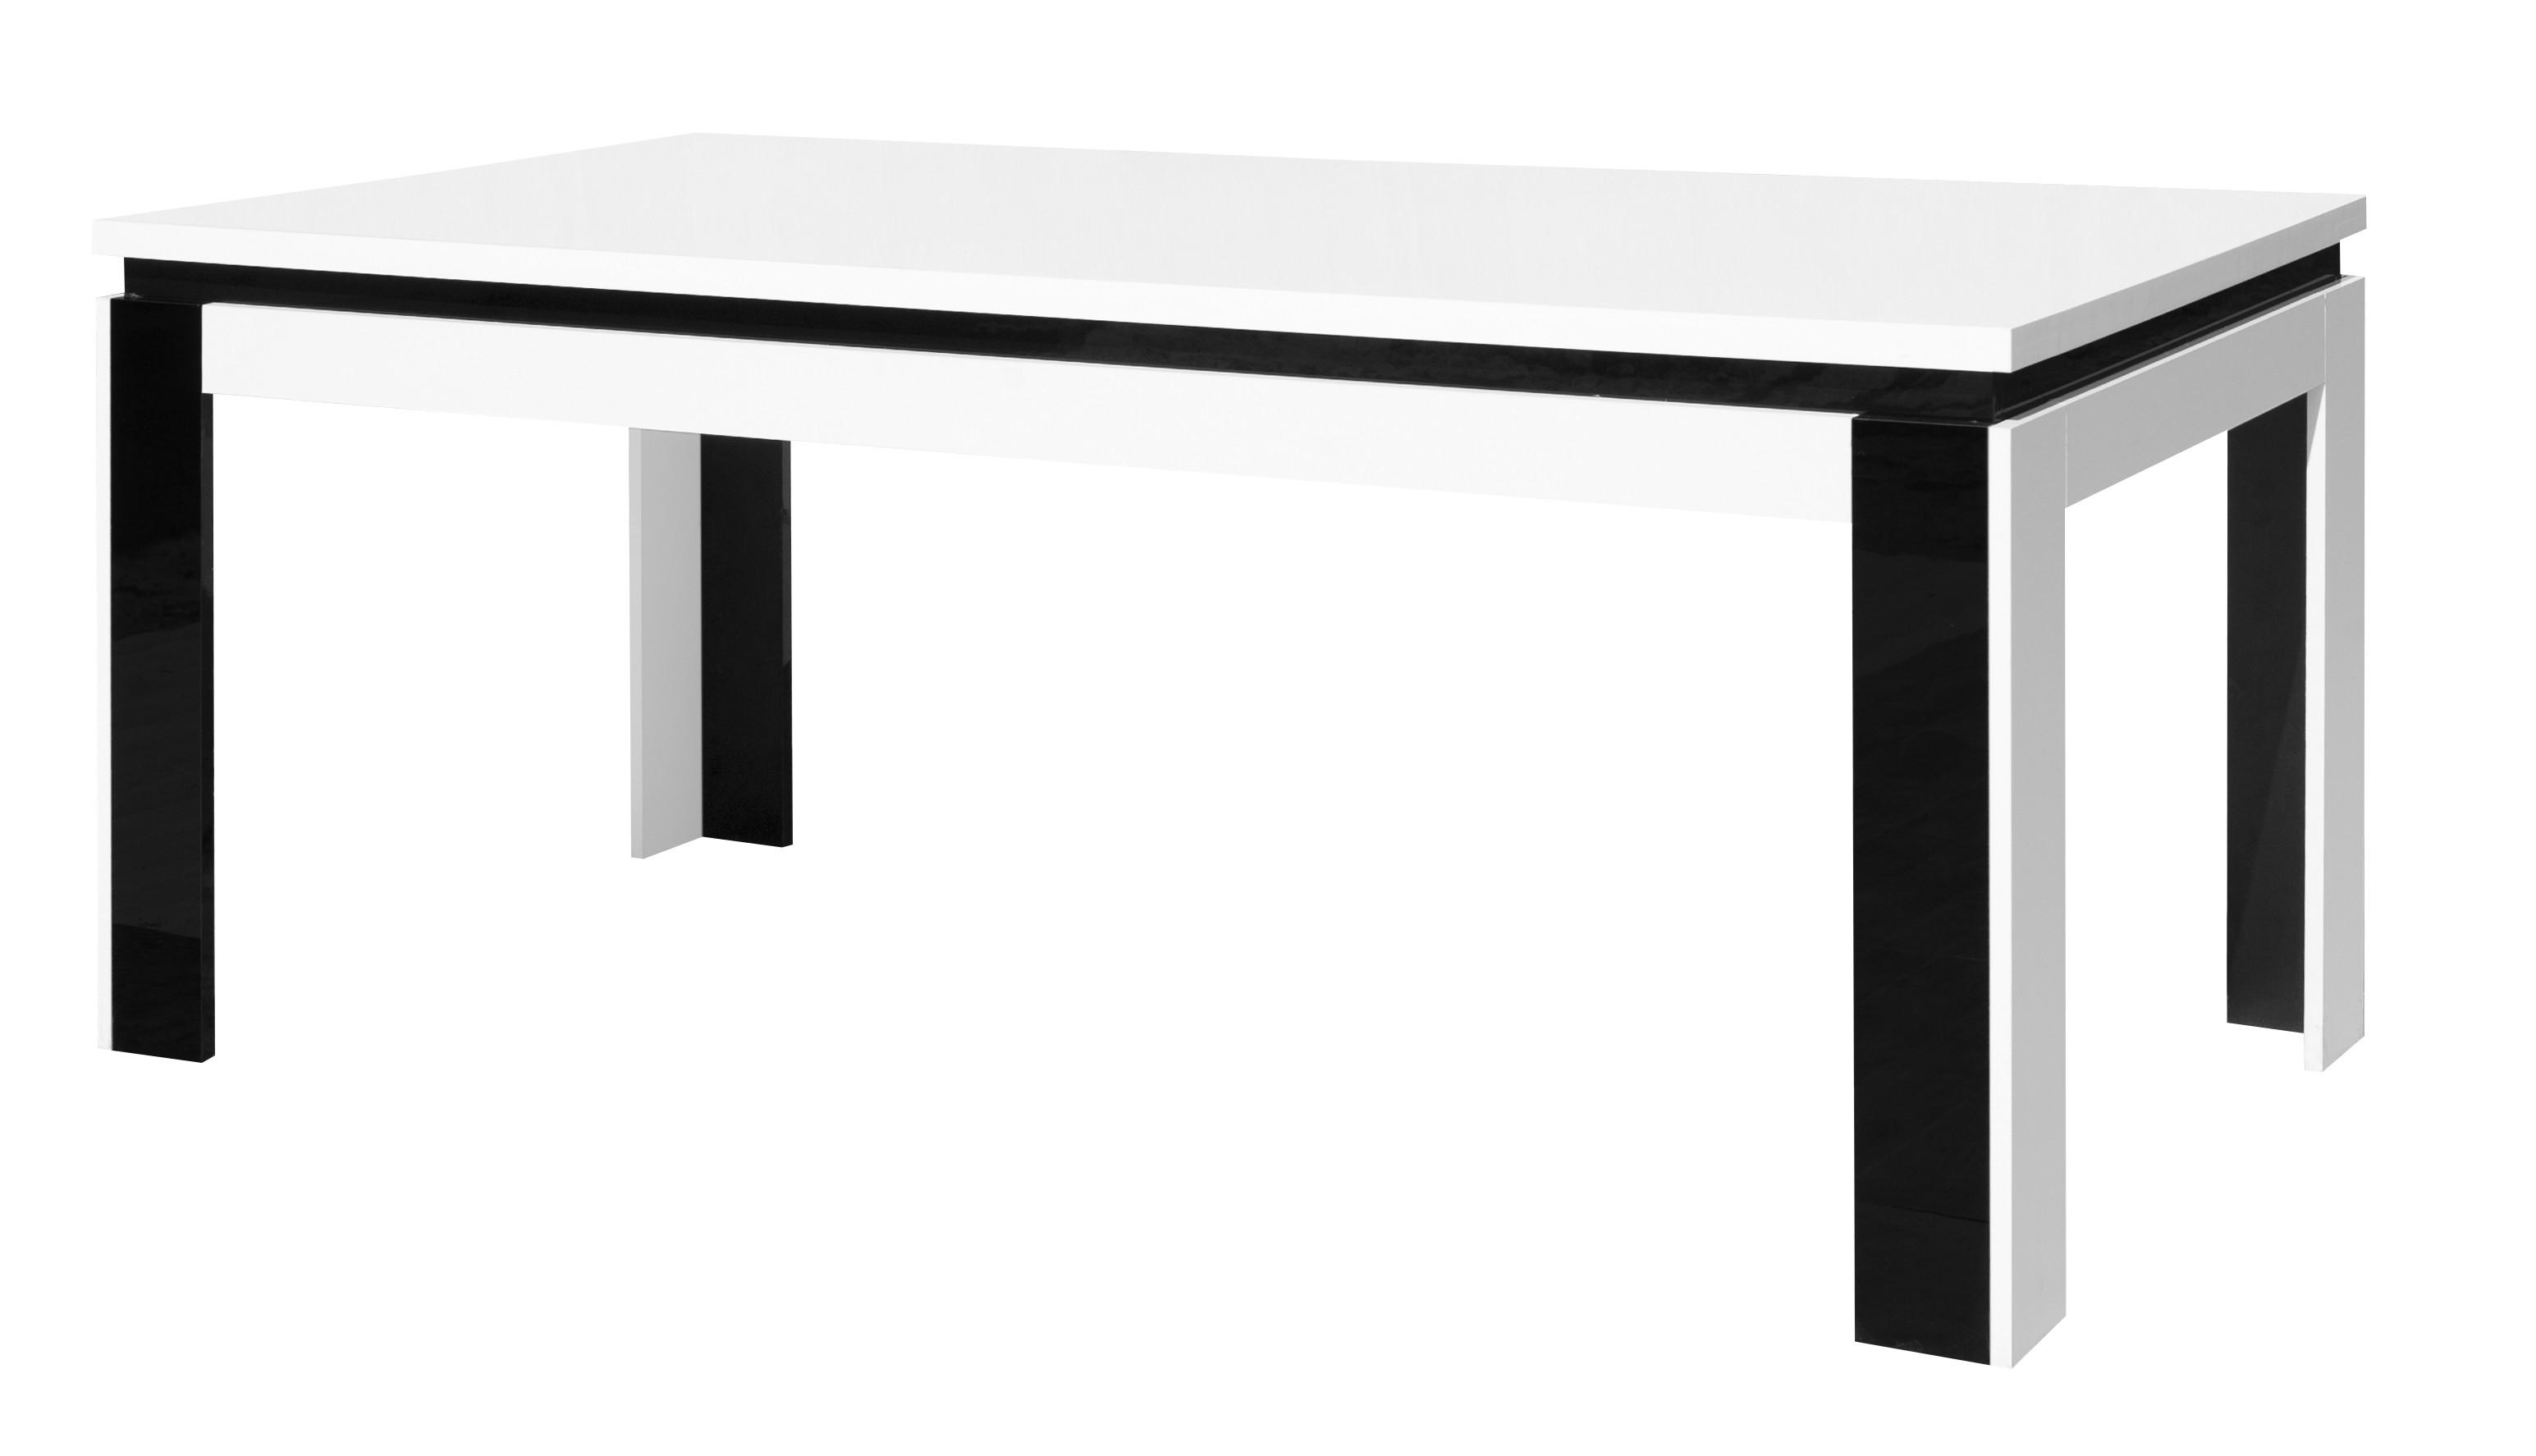 Salle manger salle manger compl te lina blanche et noire table for Table a manger complete